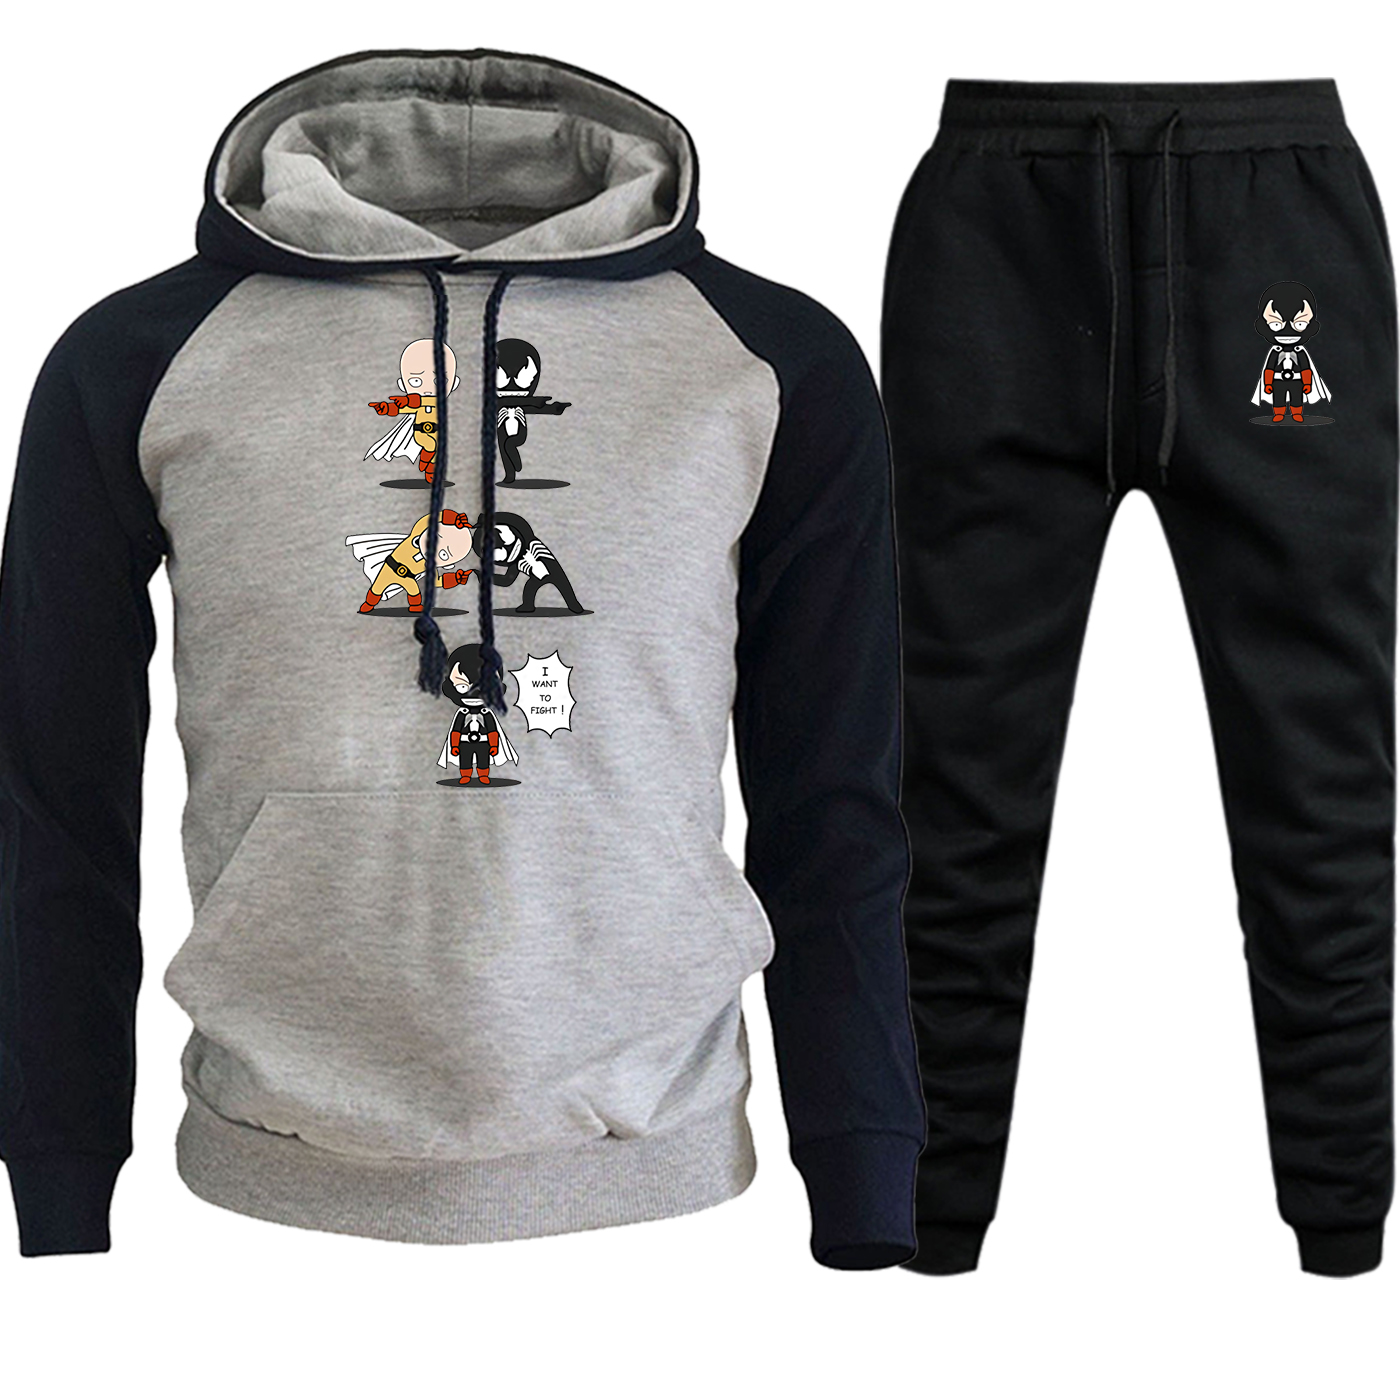 Strongest Host Ever Swetashirts Raglan Mens Hooded+Pants 2 Sets Autumn Winter 2019 Hip Hop Fleece Pullover Suit Casual Hoodie